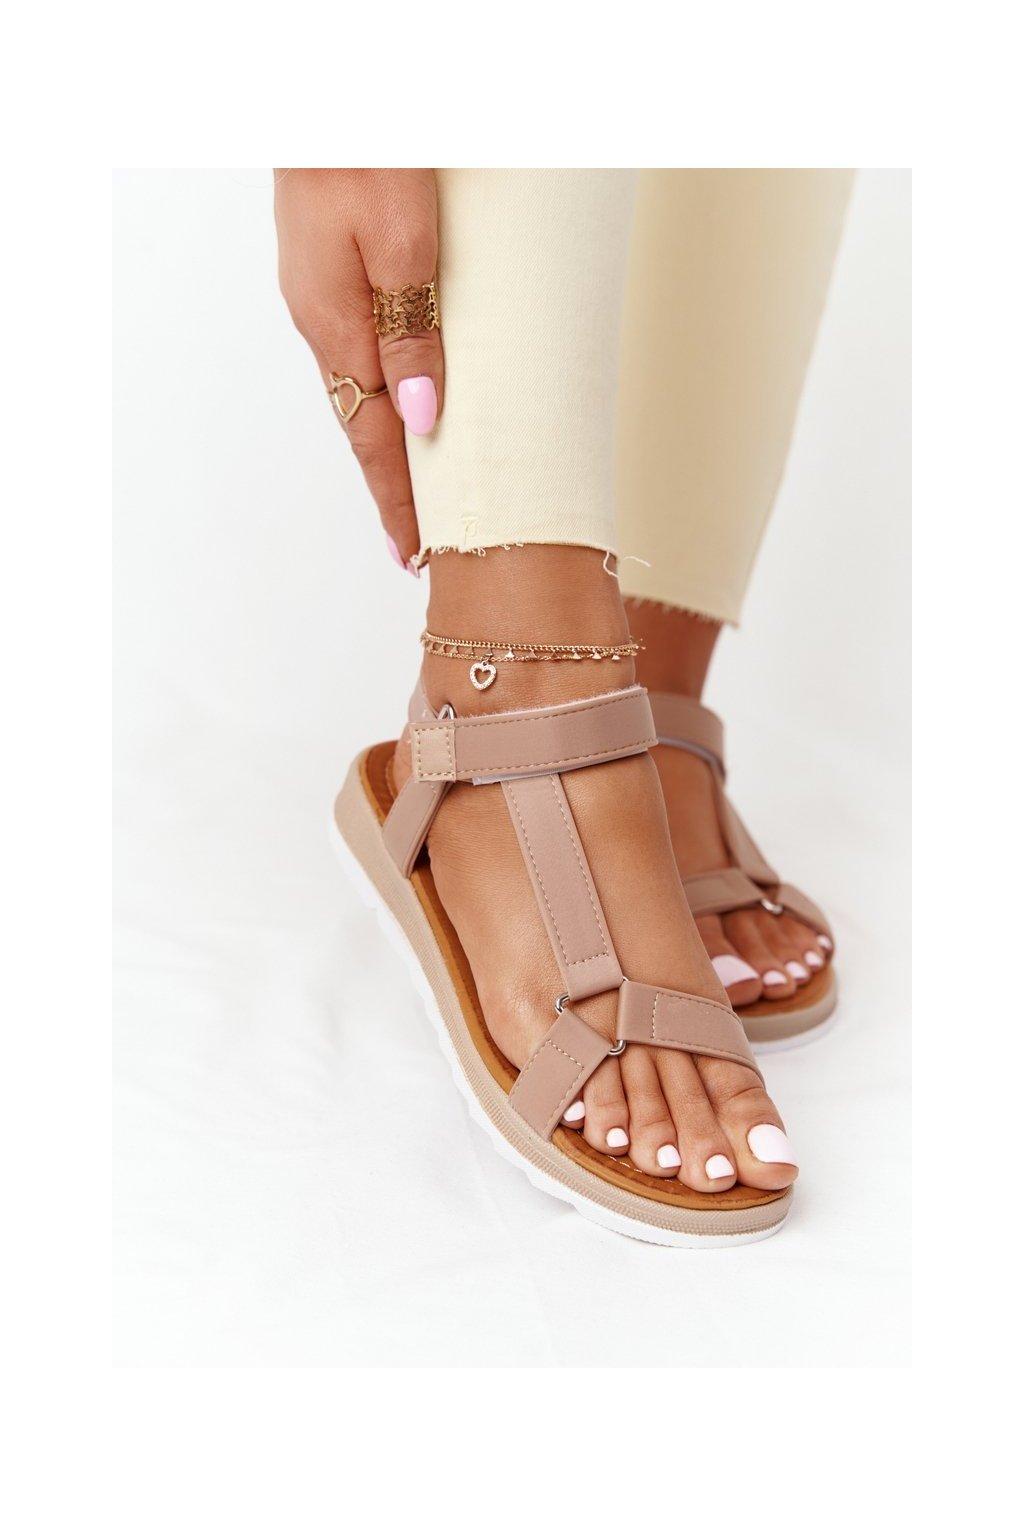 Dámske sandále s plochou podrážkou farba hnedá kód obuvi WS9027-41 KHAKI